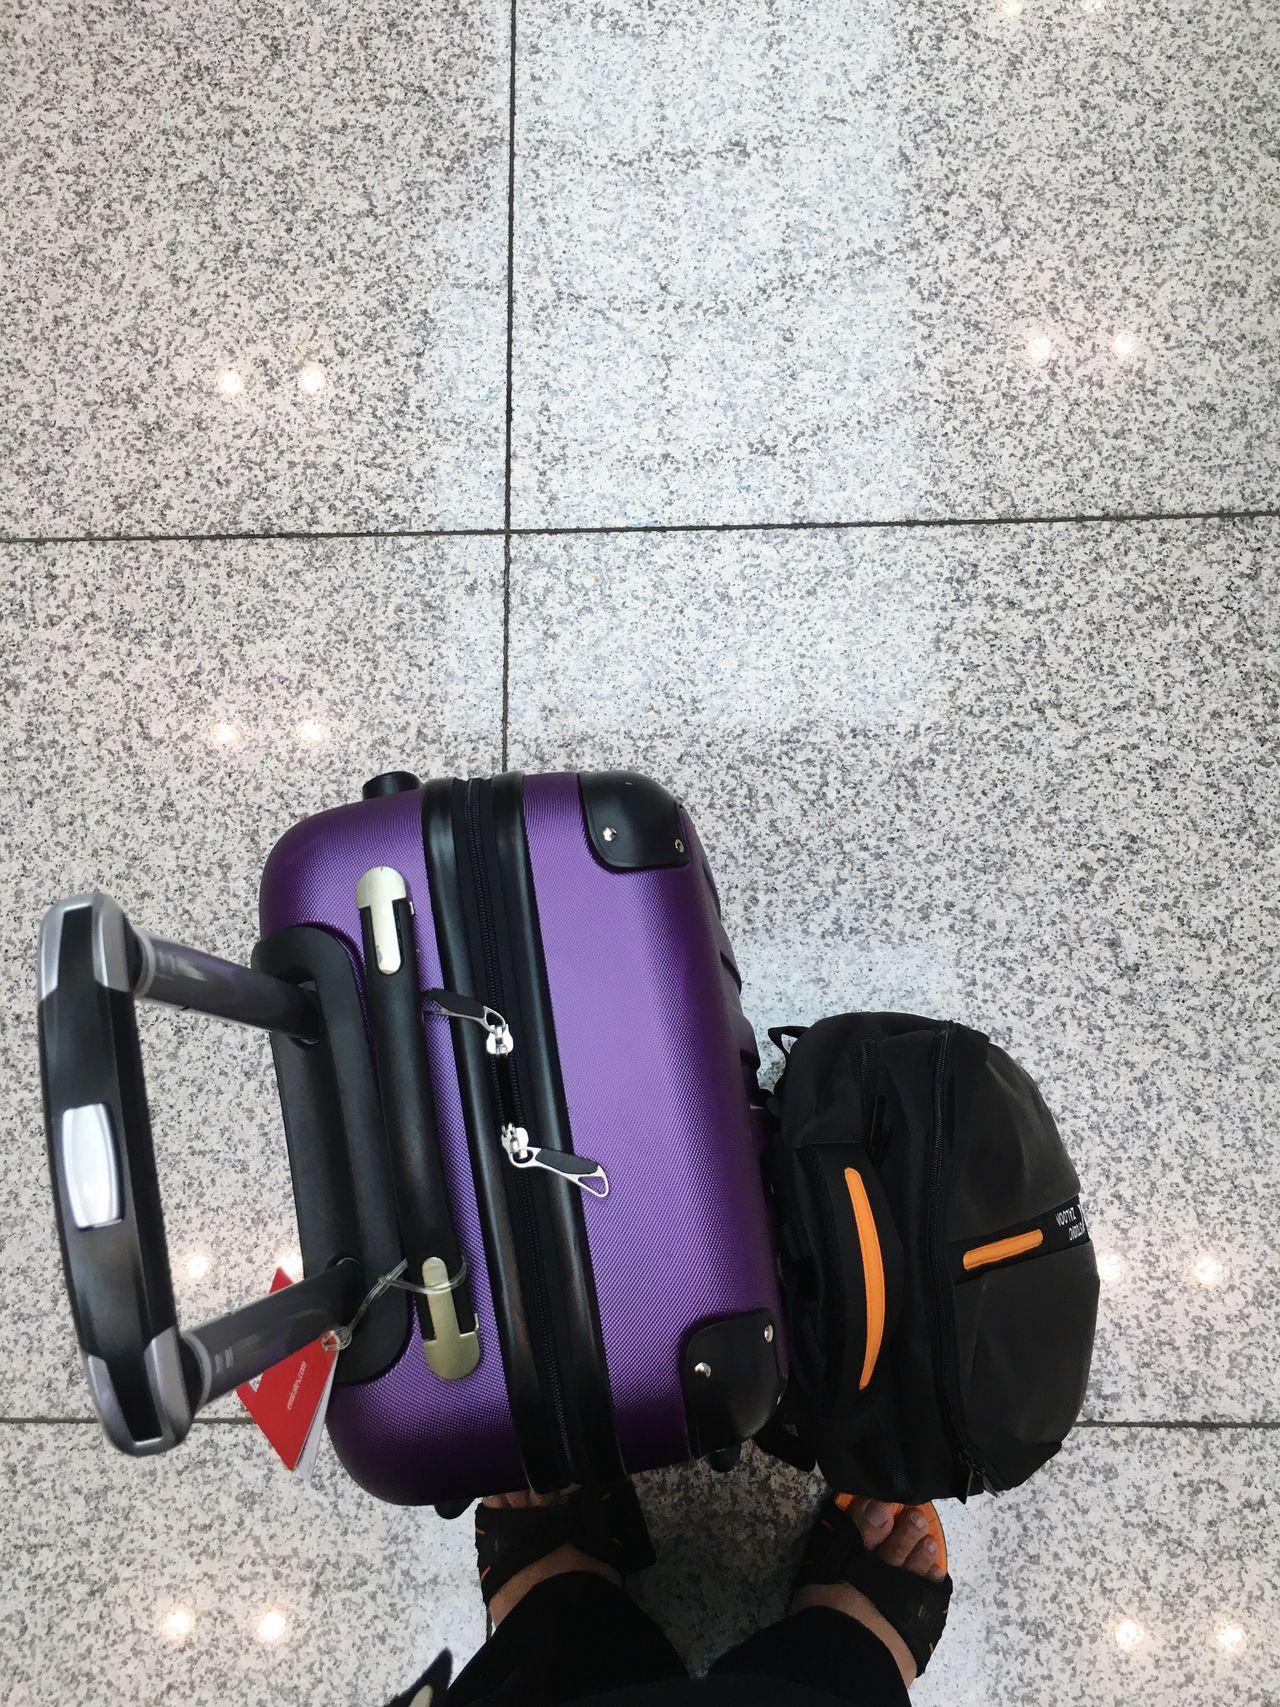 Beautiful stock photos of airport, Backpack, Flooring, Human Body Part, Human Foot